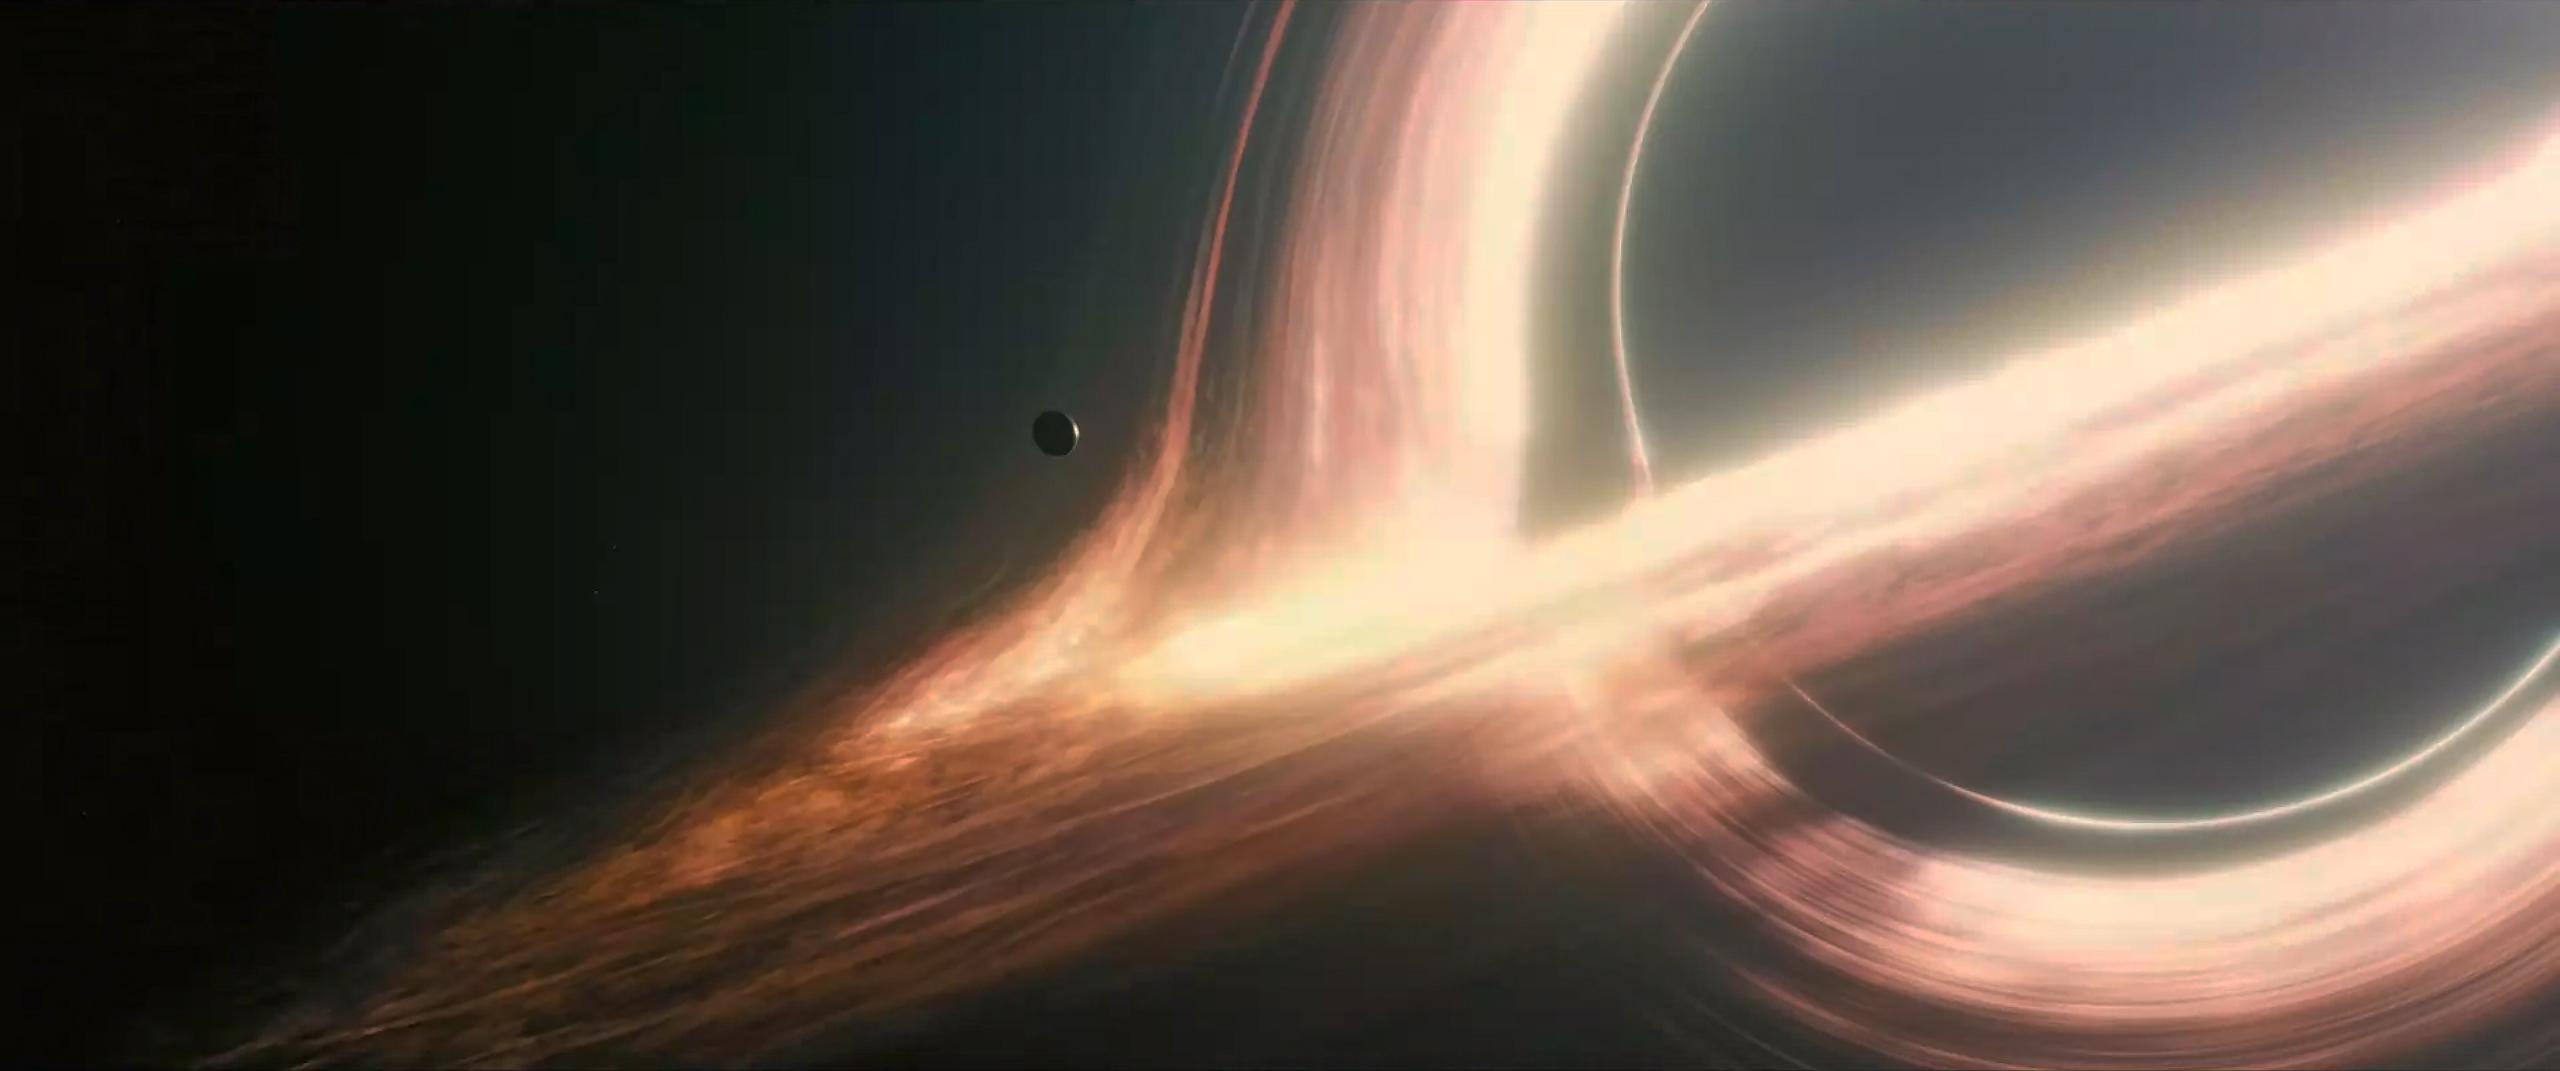 "The supermassive black hole Gargantua plays a major role in the 2014 sci-fi blockbuster ""Interstellar.""  Paramount"